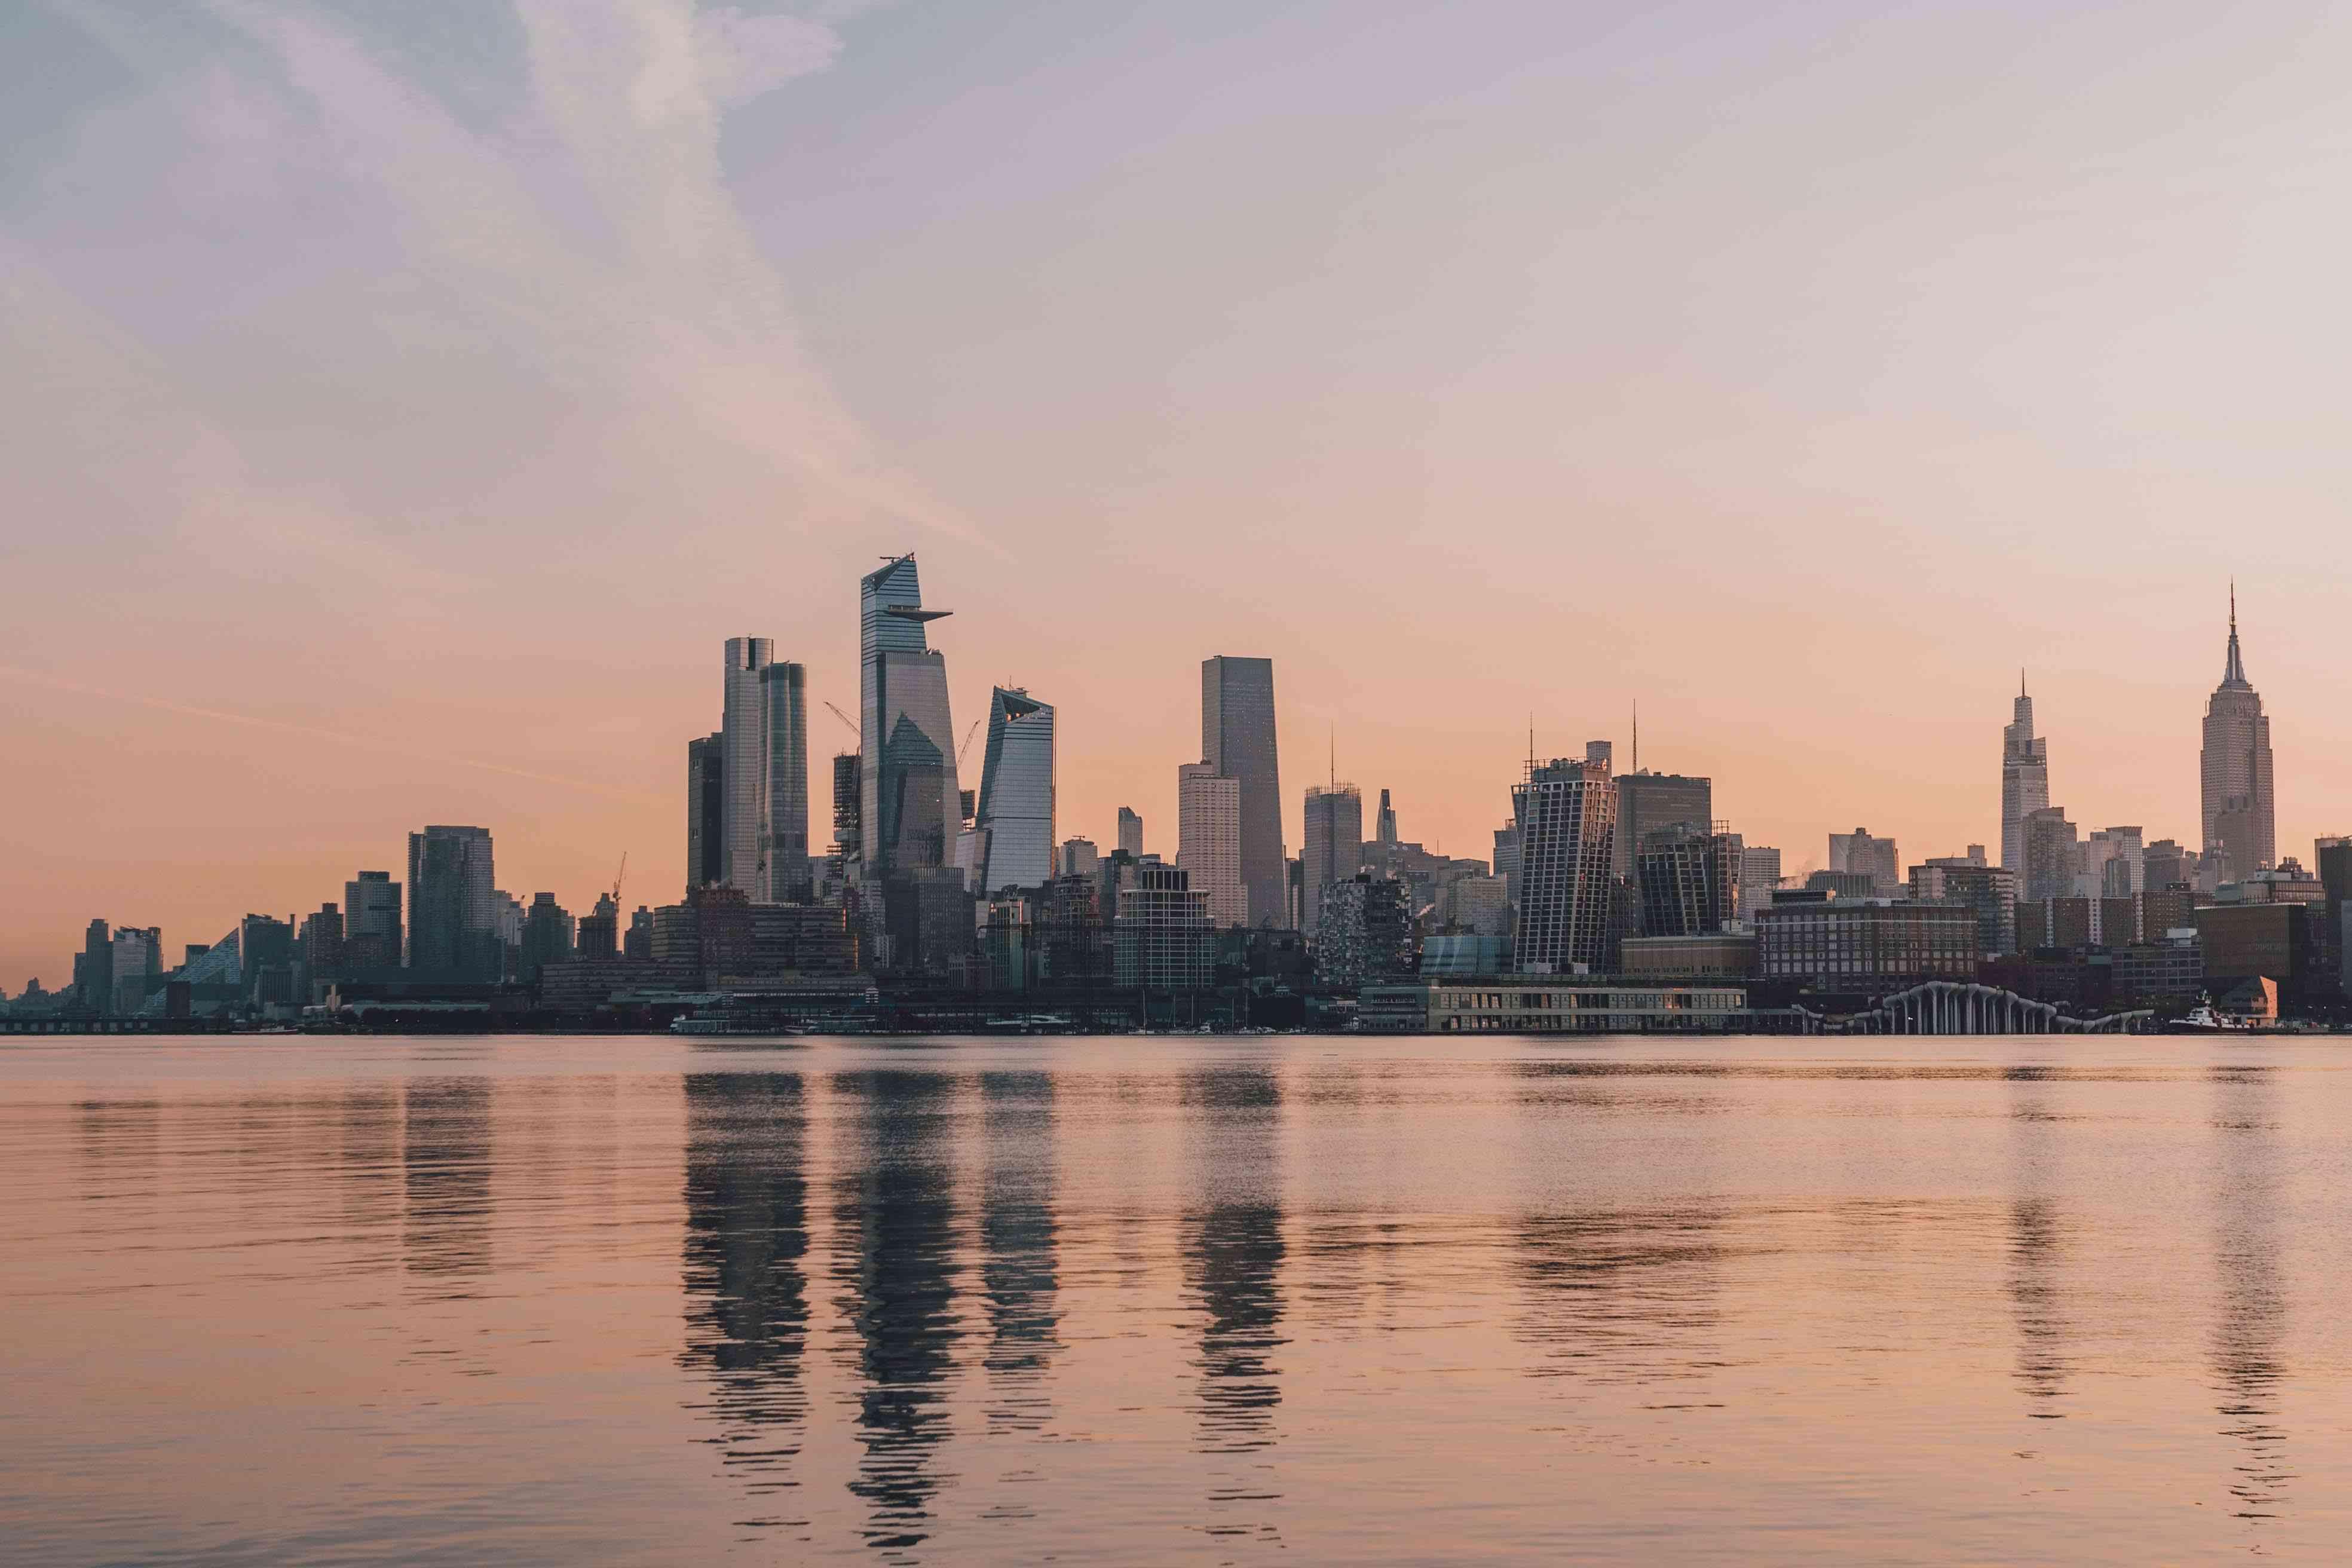 Views of NYC skyline from Hoboken